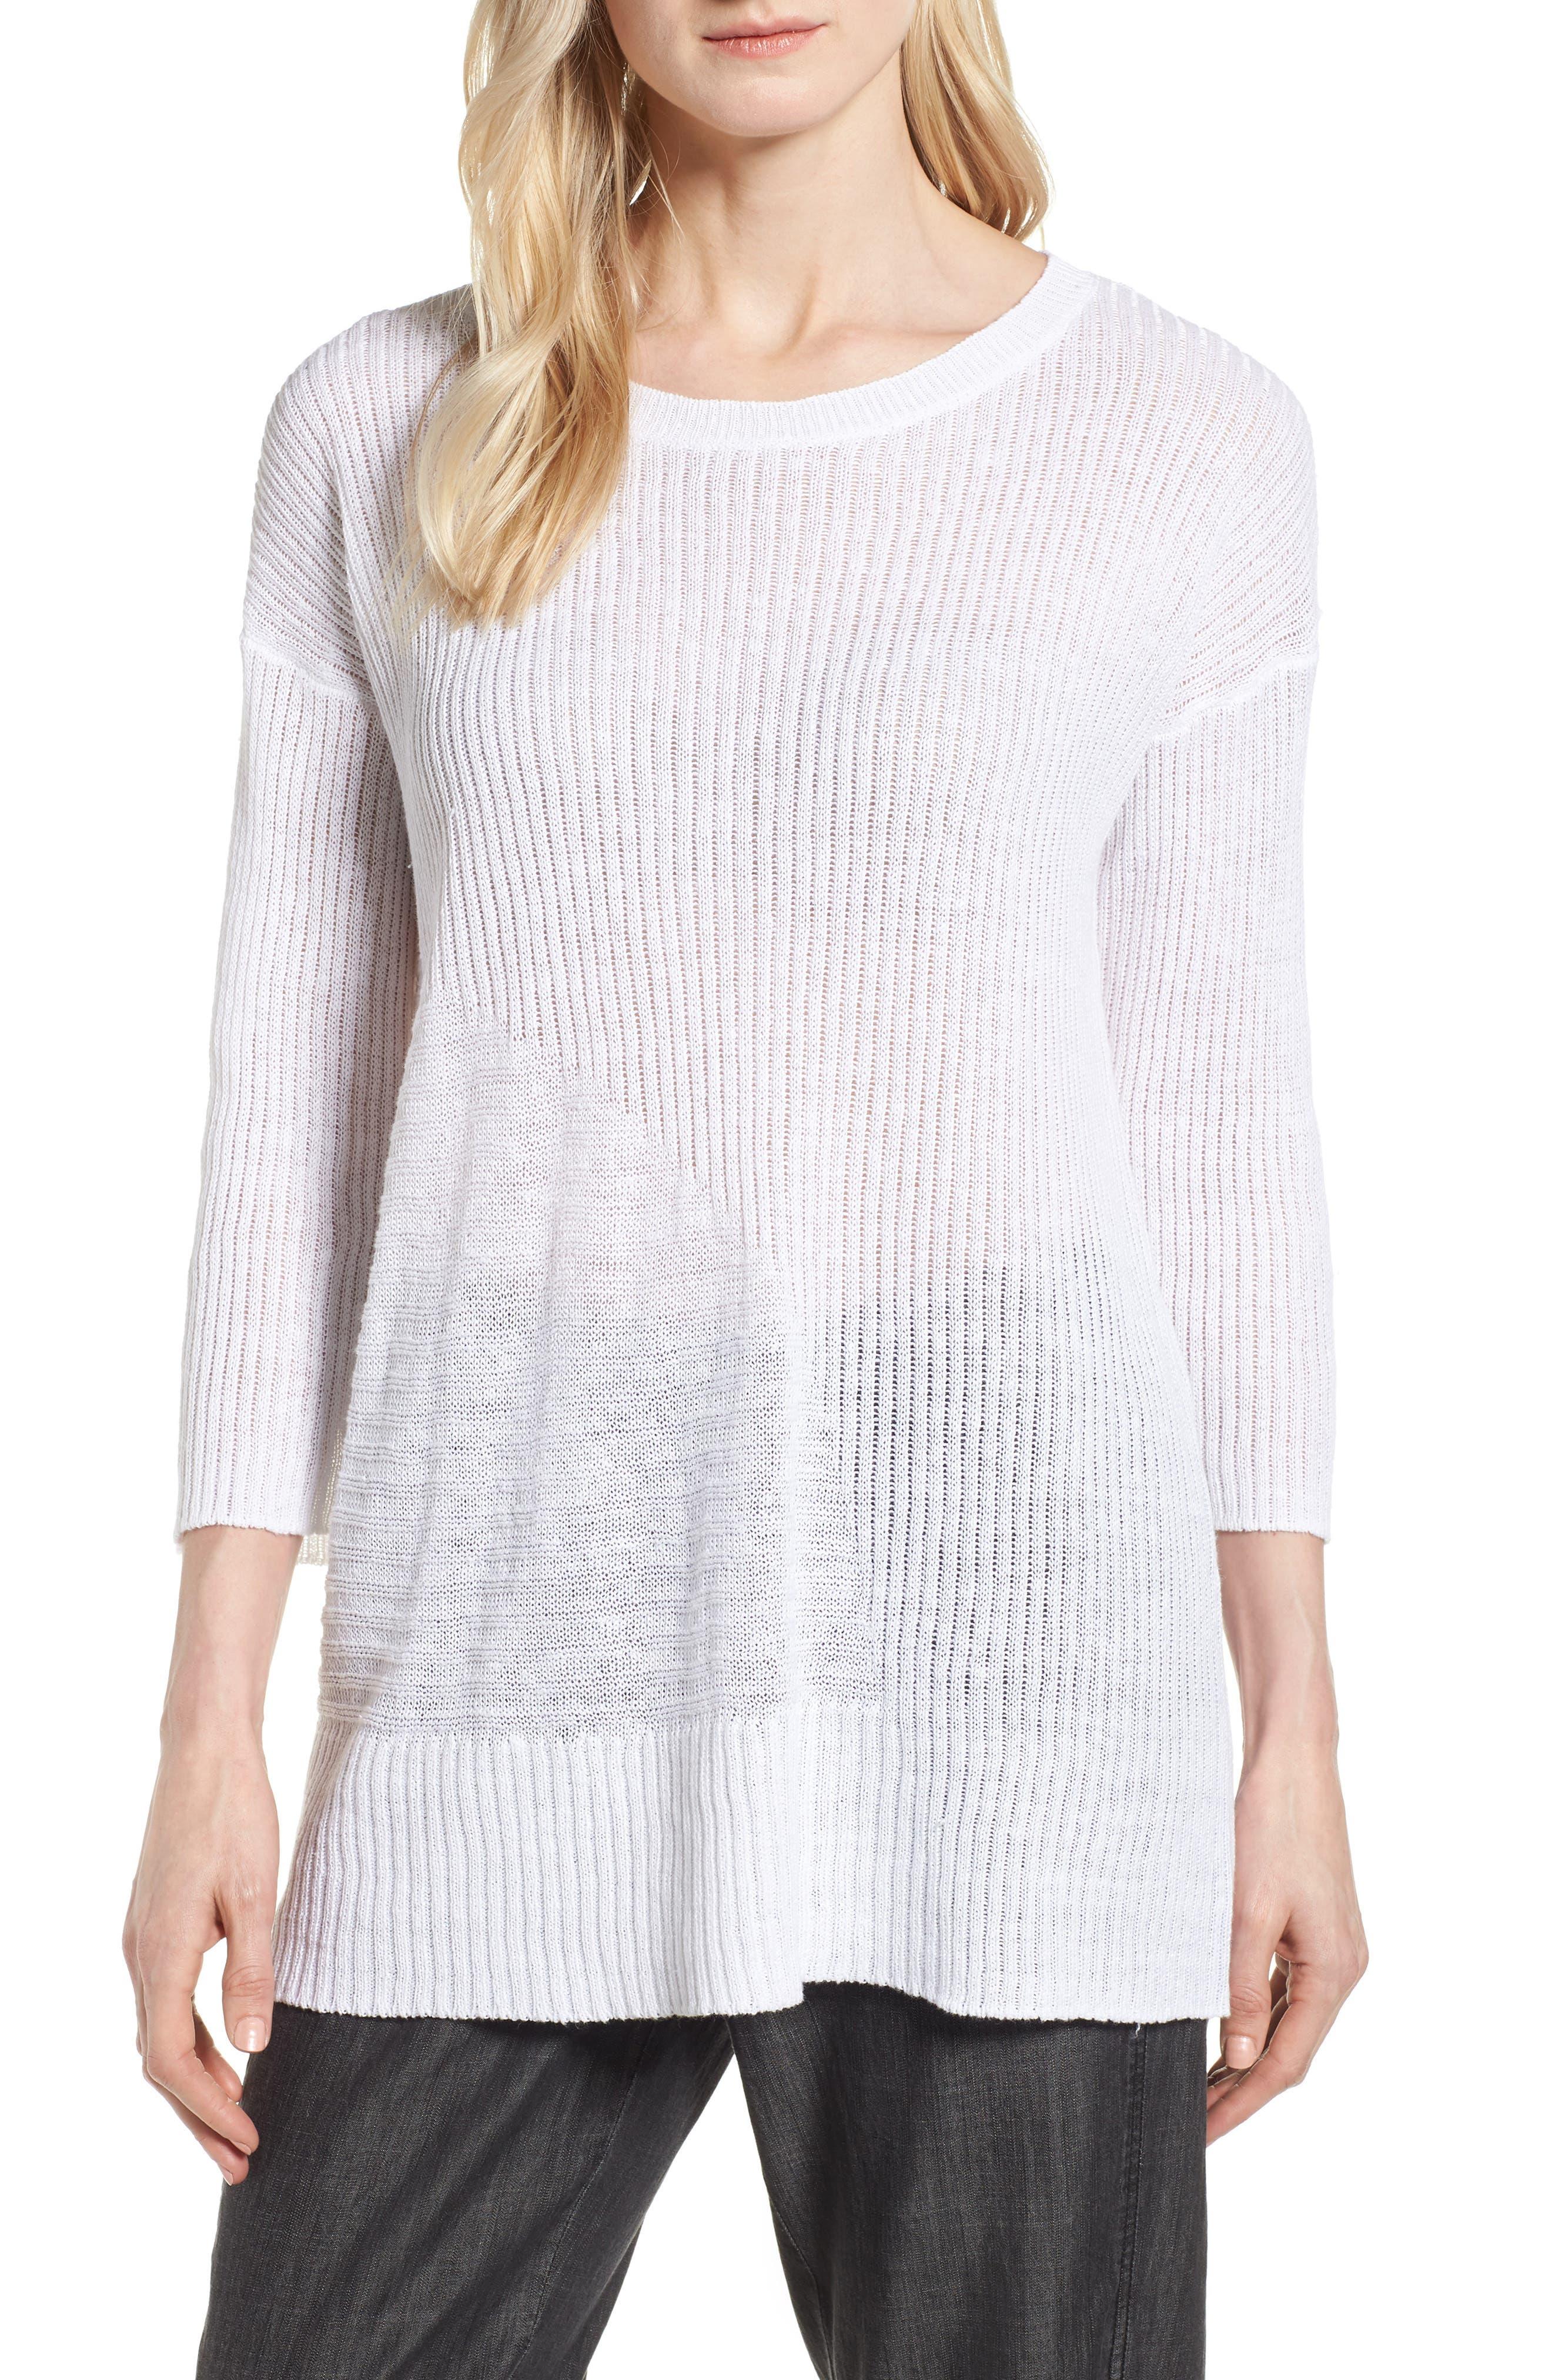 Organic Linen Tunic Sweater,                             Main thumbnail 1, color,                             100